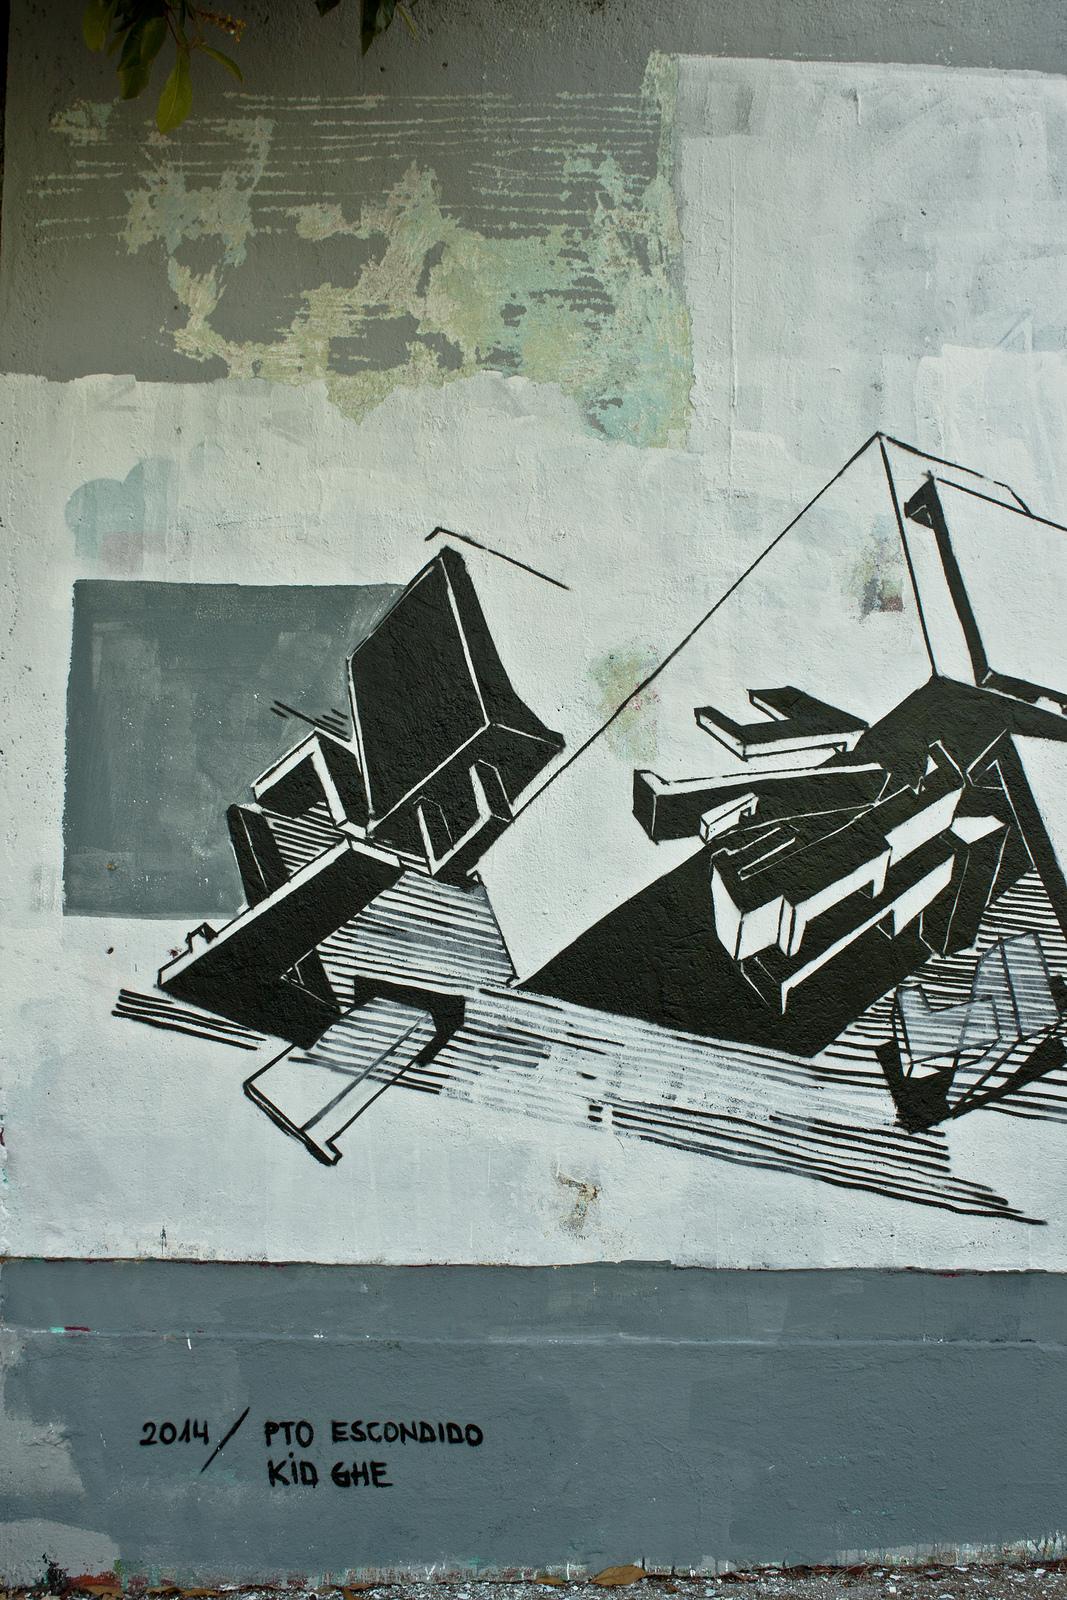 kidghe-desgaste-new-mural-in-puerto-escondido-oaxaca-03